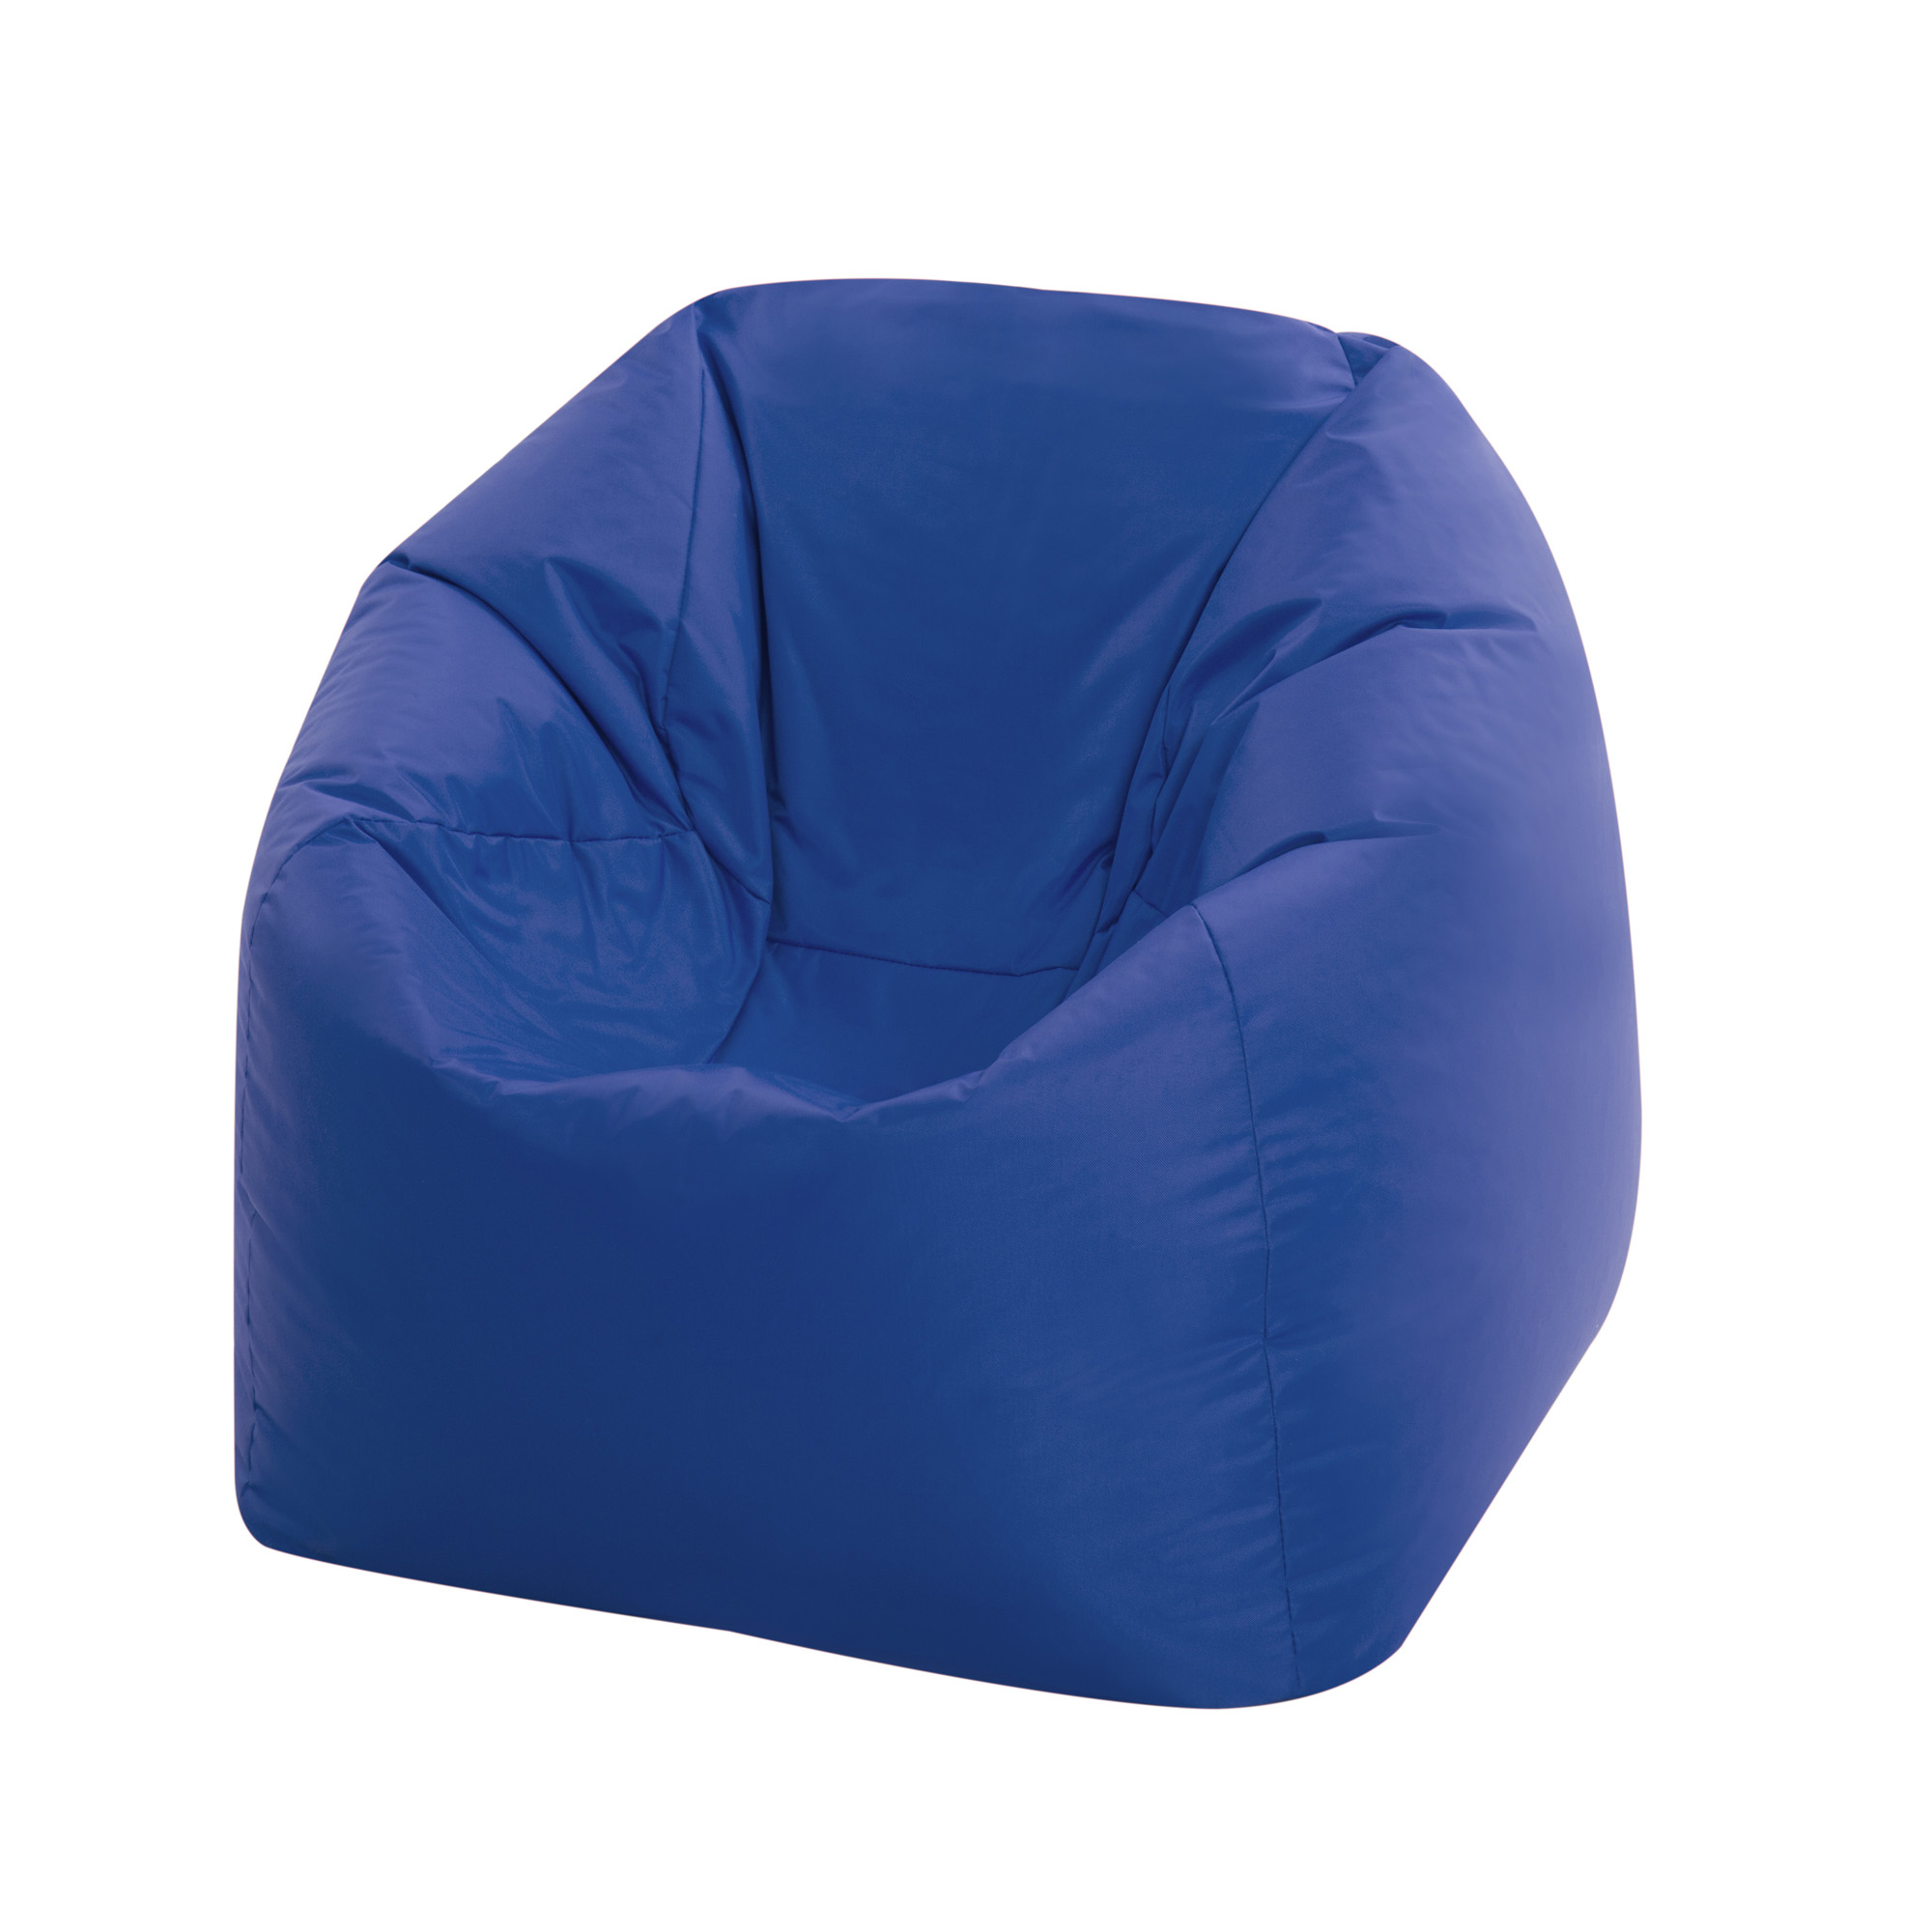 Eden-New-Nursery-Beanbag-blue-300dpi-2